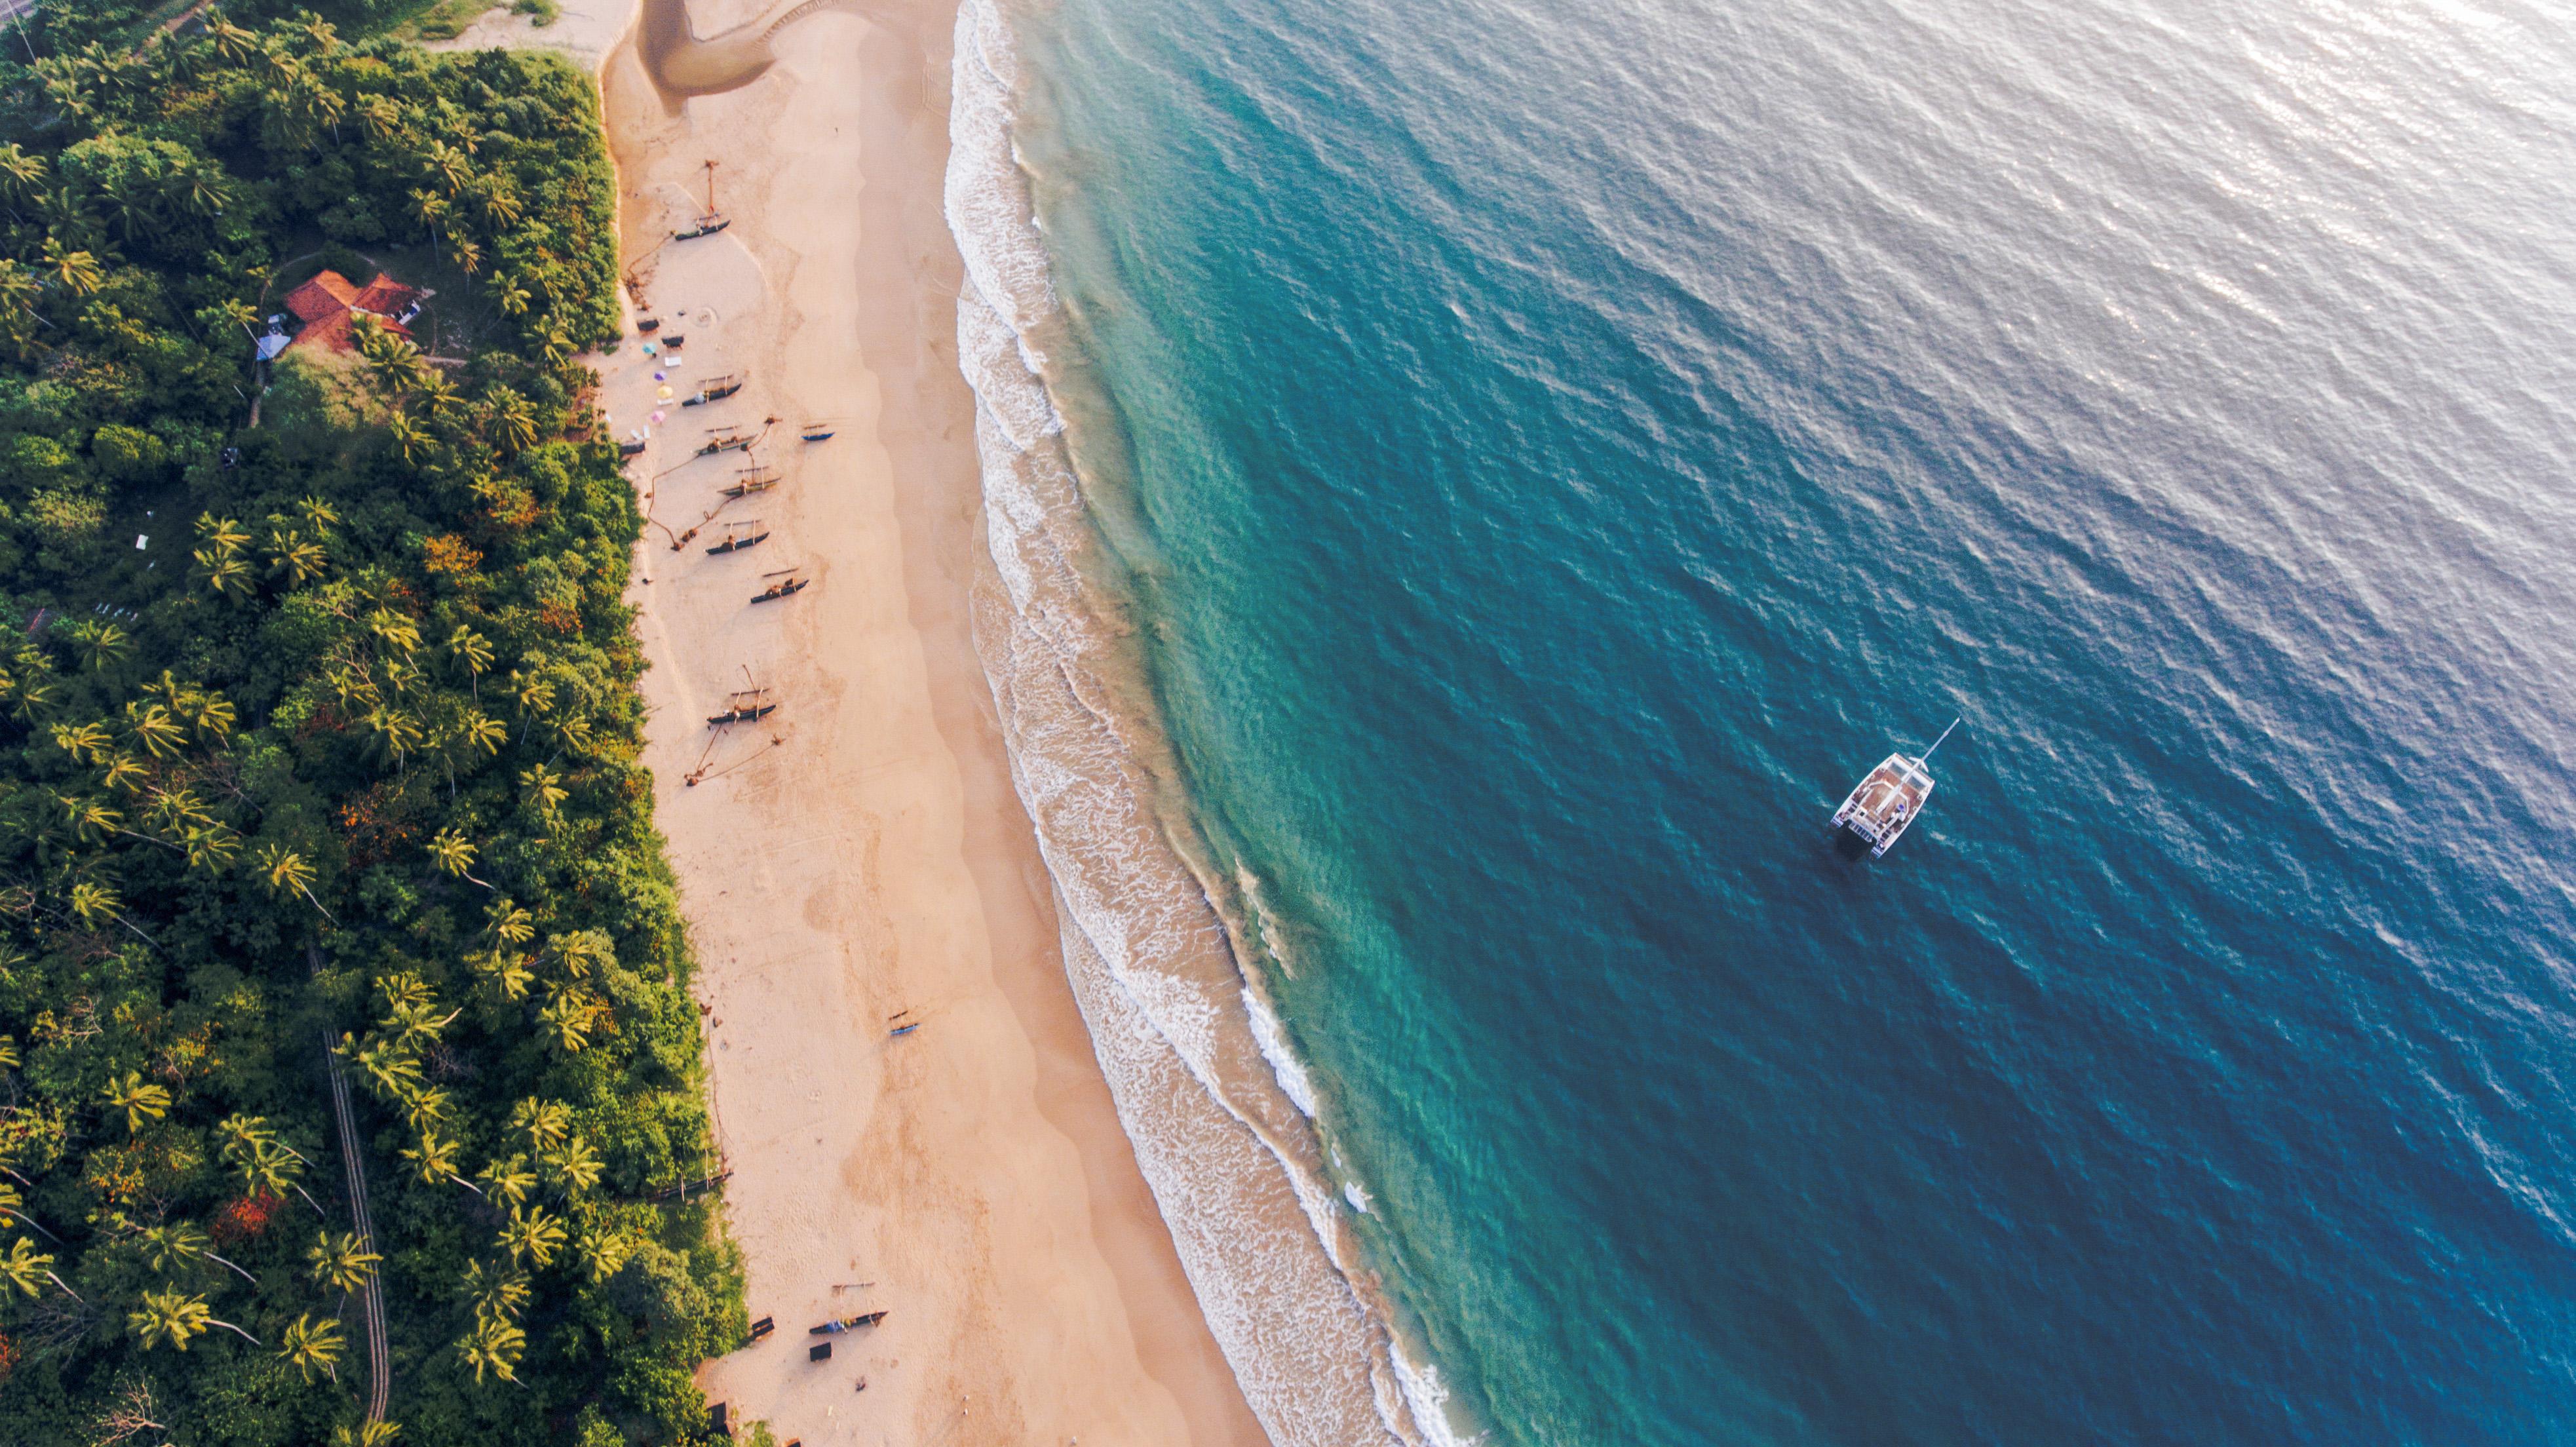 Sri Lanka Sailboat Drone Shot - Supplier Photos Residential Cruise SOUTH 43 2017 Lg RGB